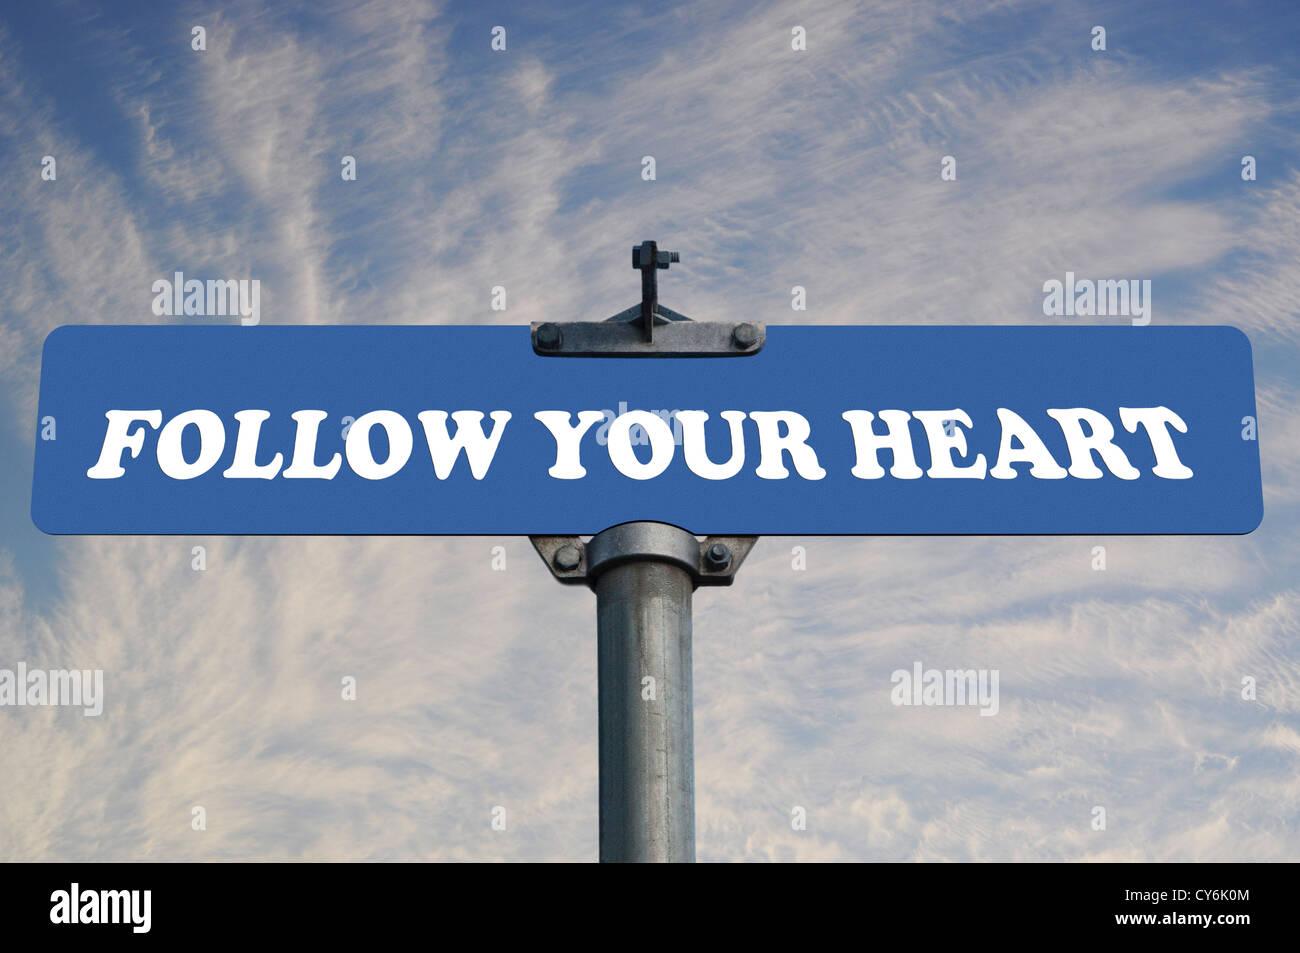 Follow My Heart Stock Photos & Follow My Heart Stock Images - Alamy